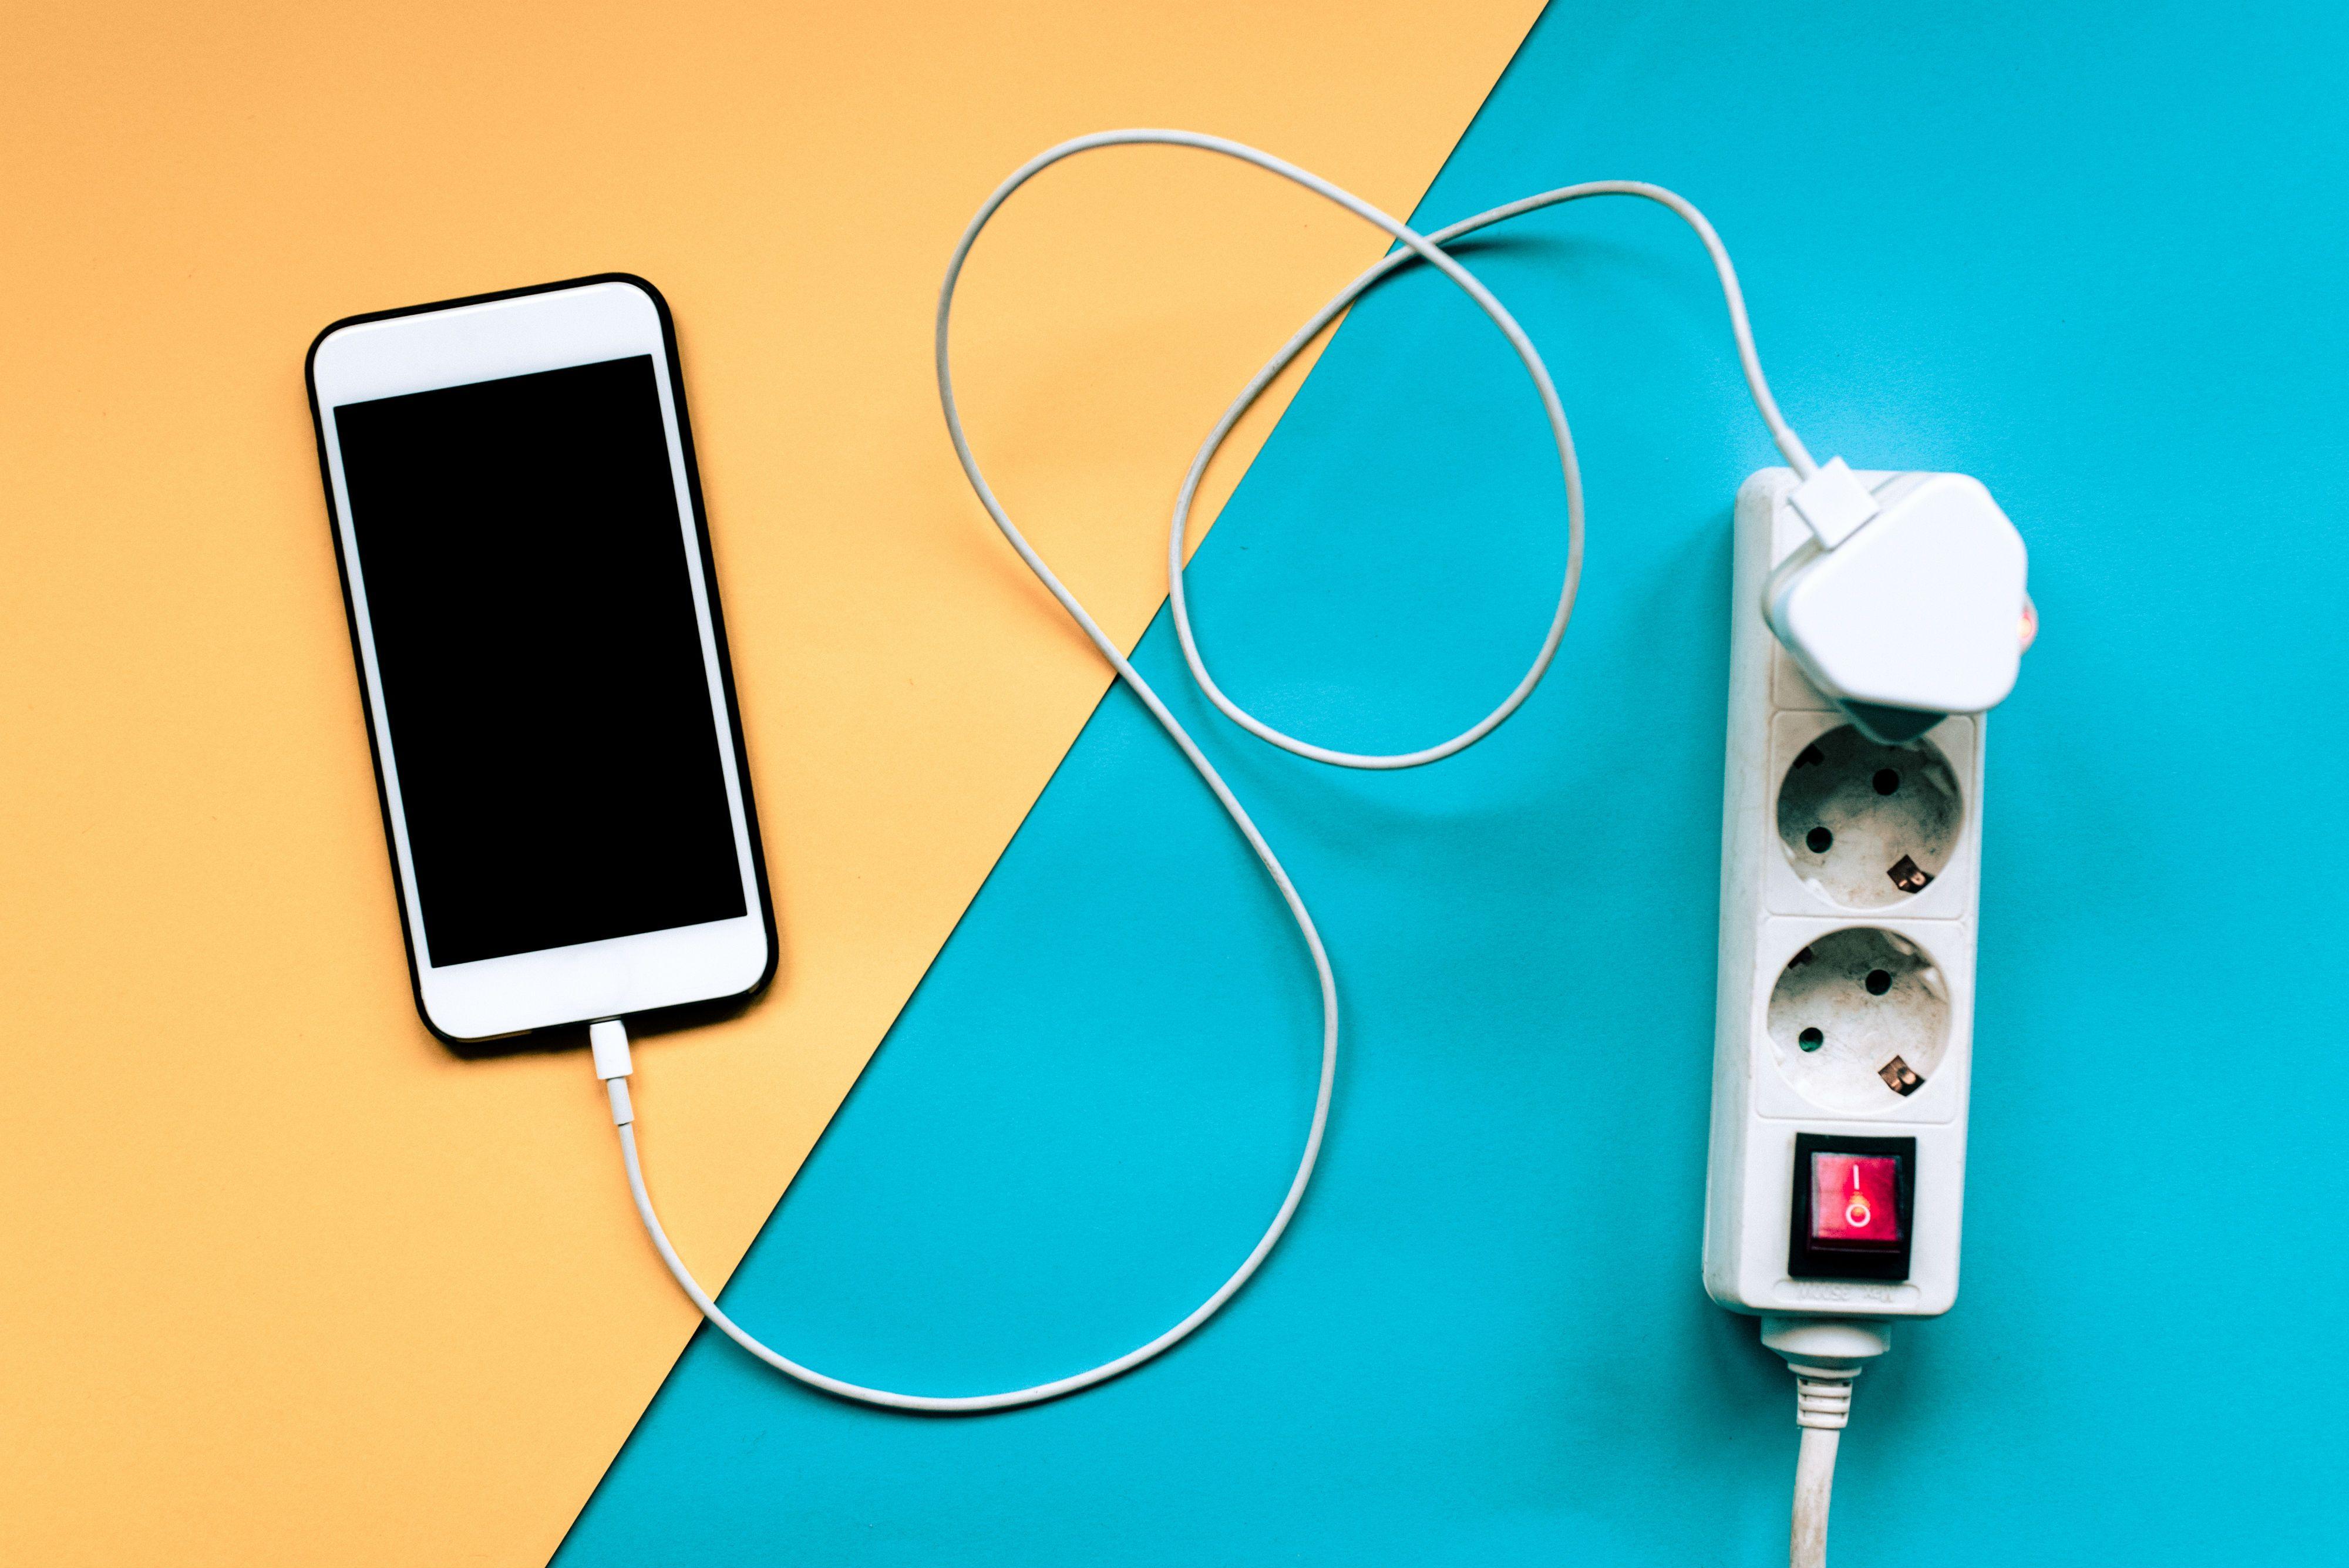 Stromverbrauch Handy Ladegerät